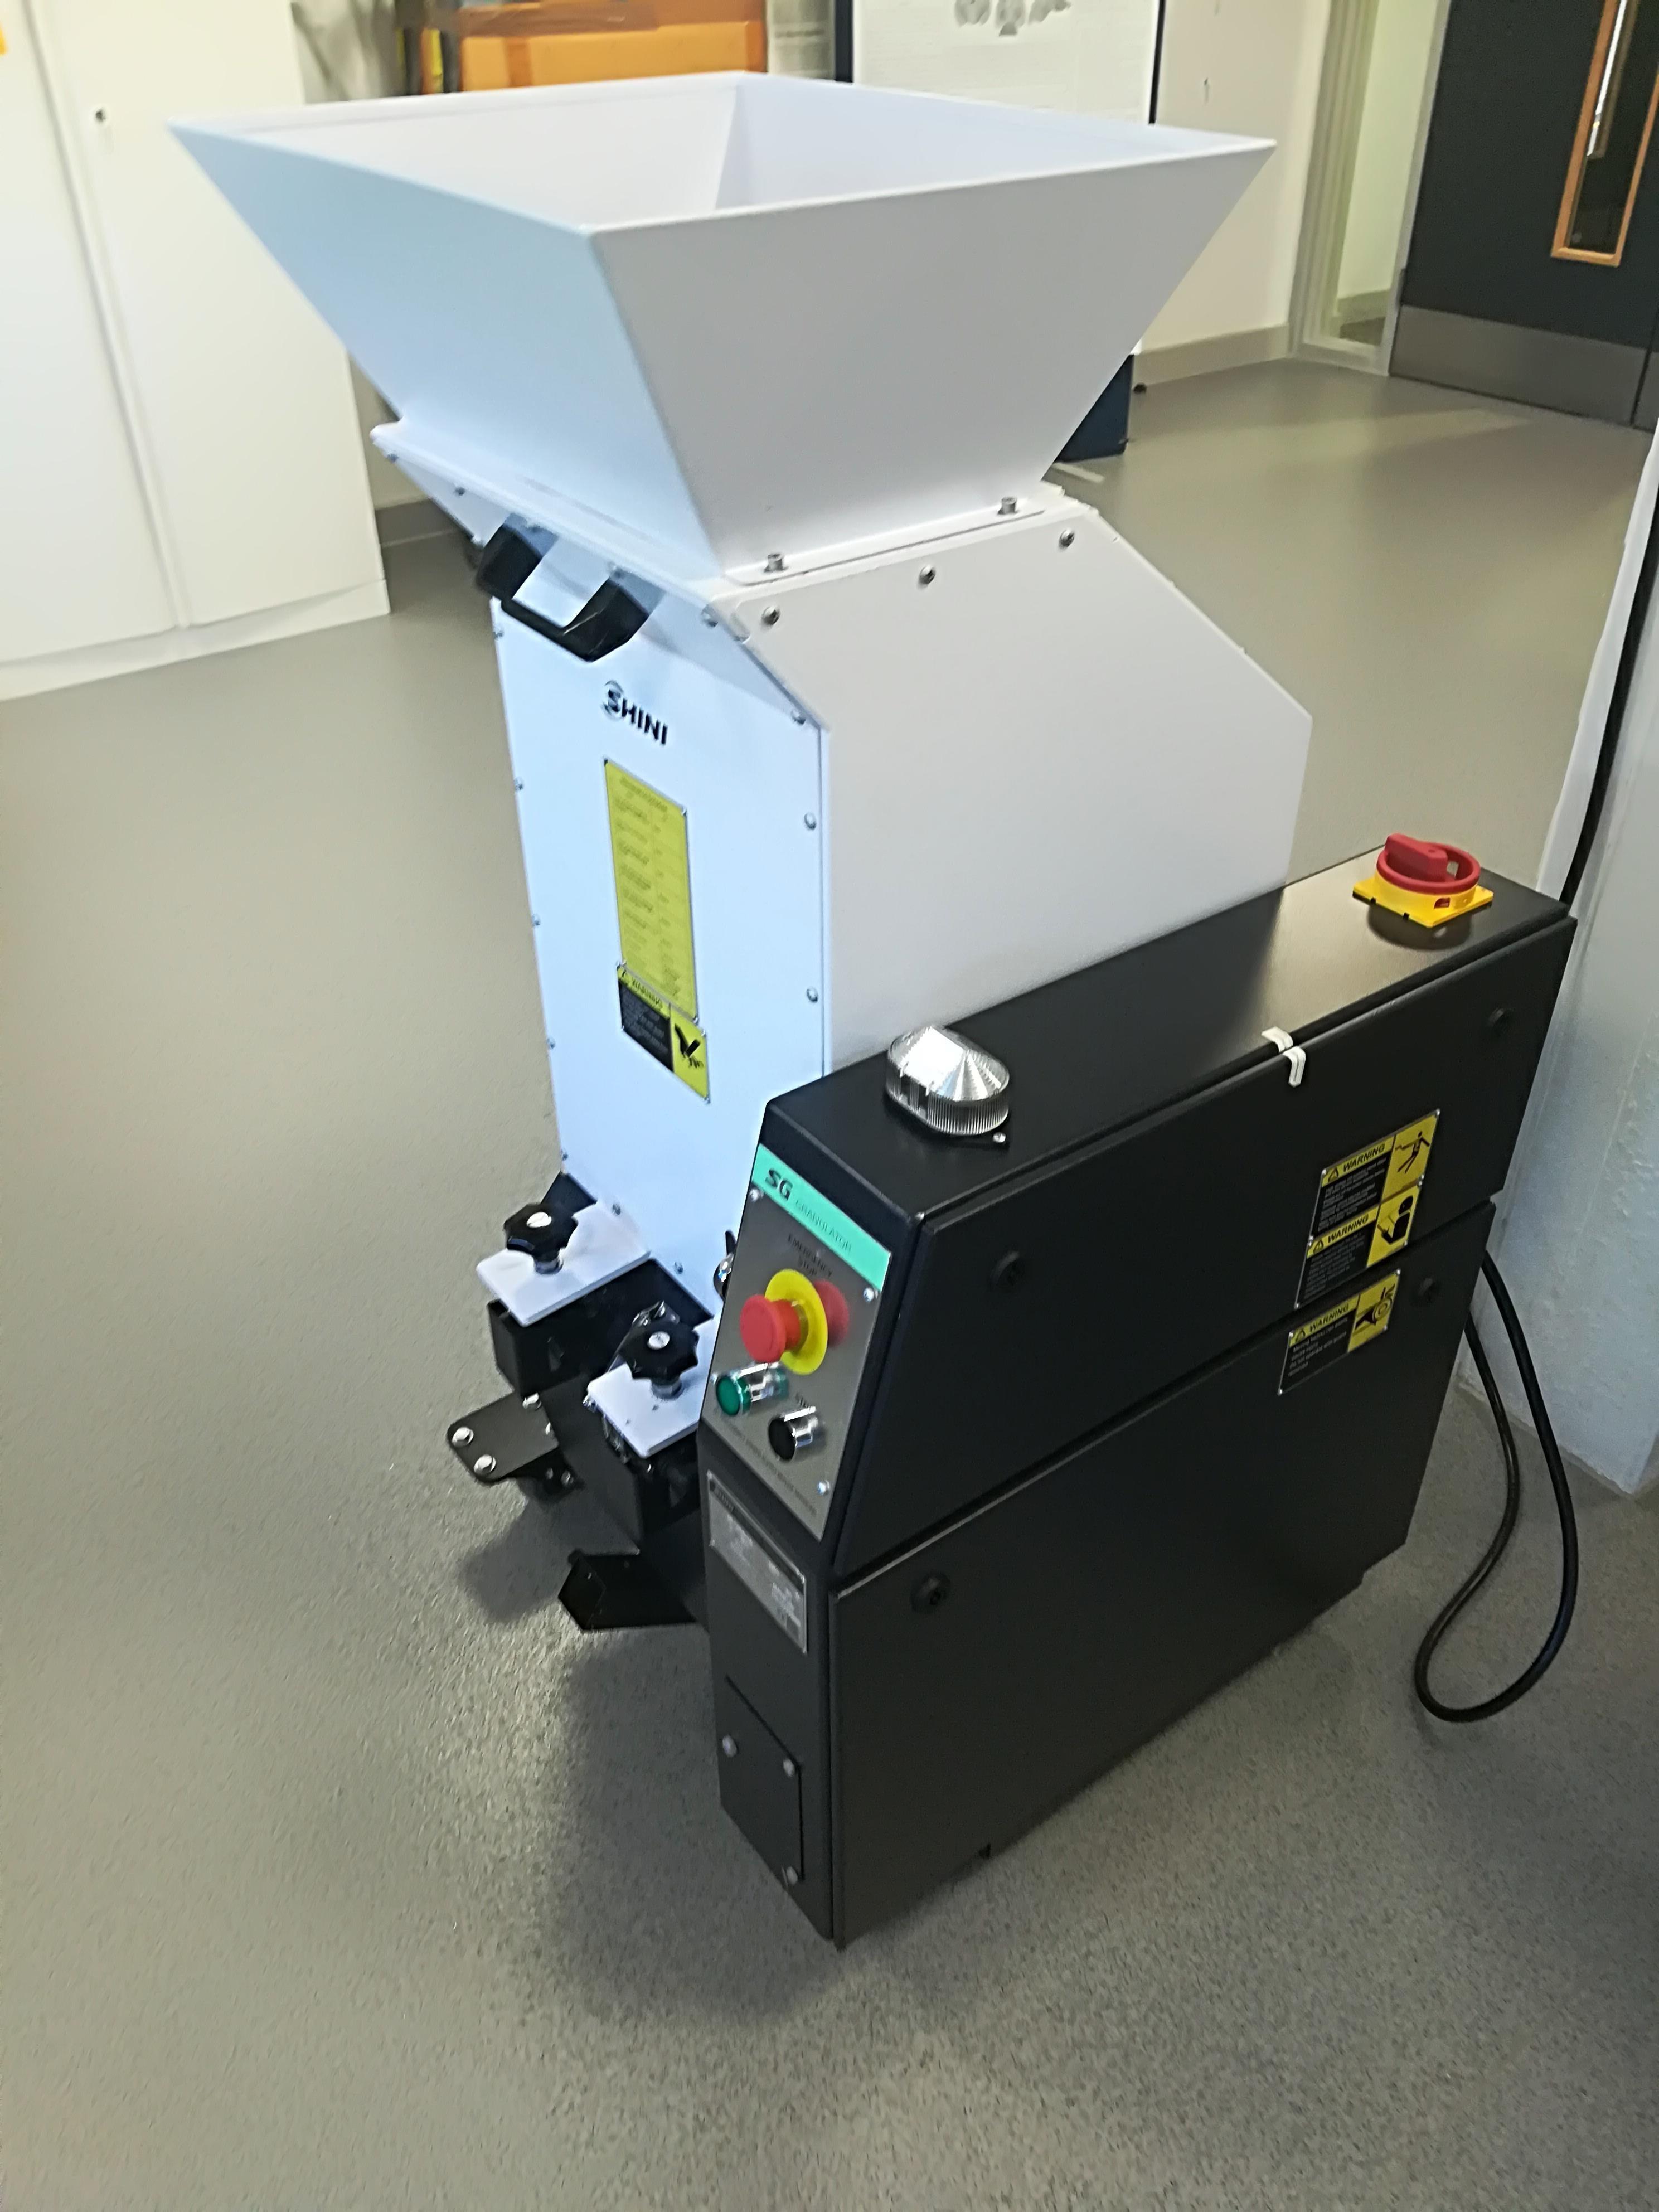 3D printer recycling unit